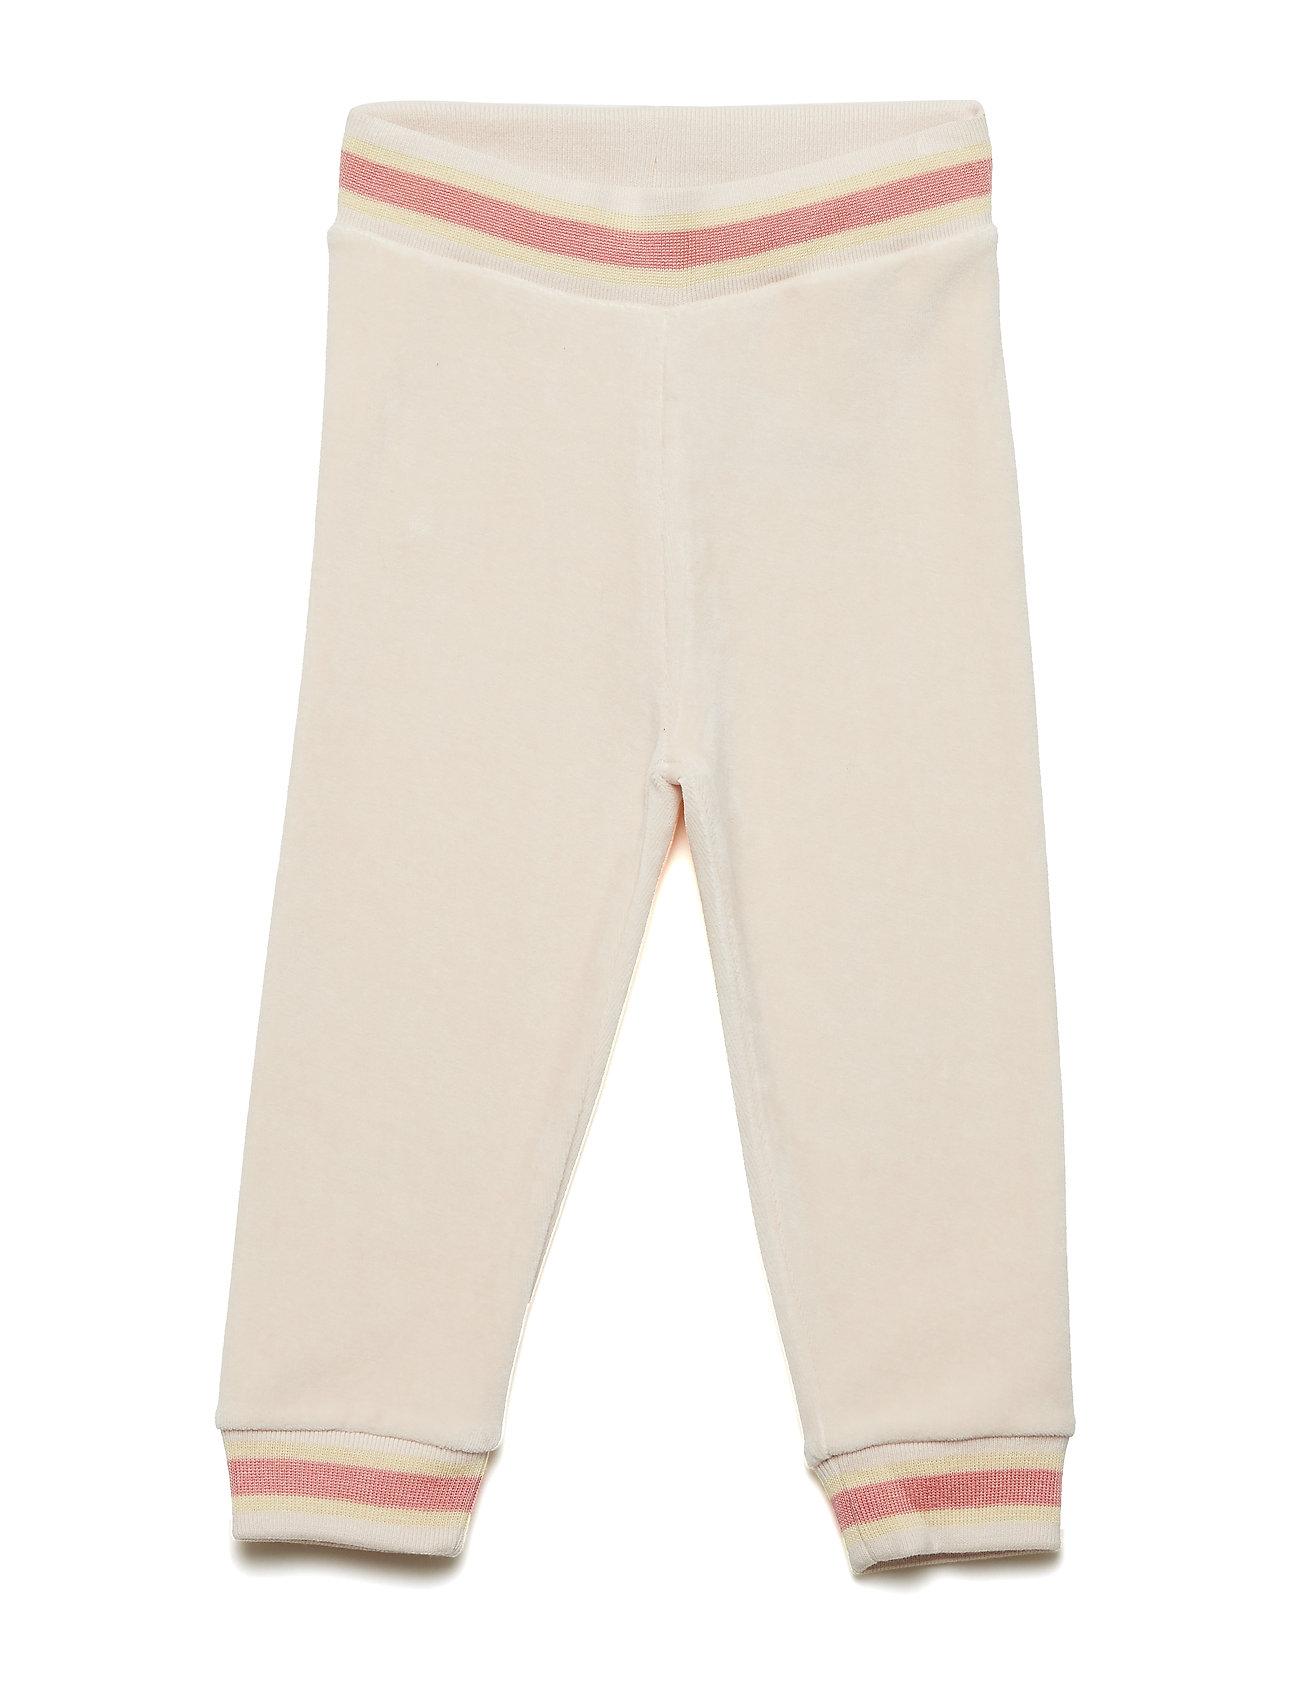 Mini A Ture Jordy Pants, B - CRéME DE PECHE